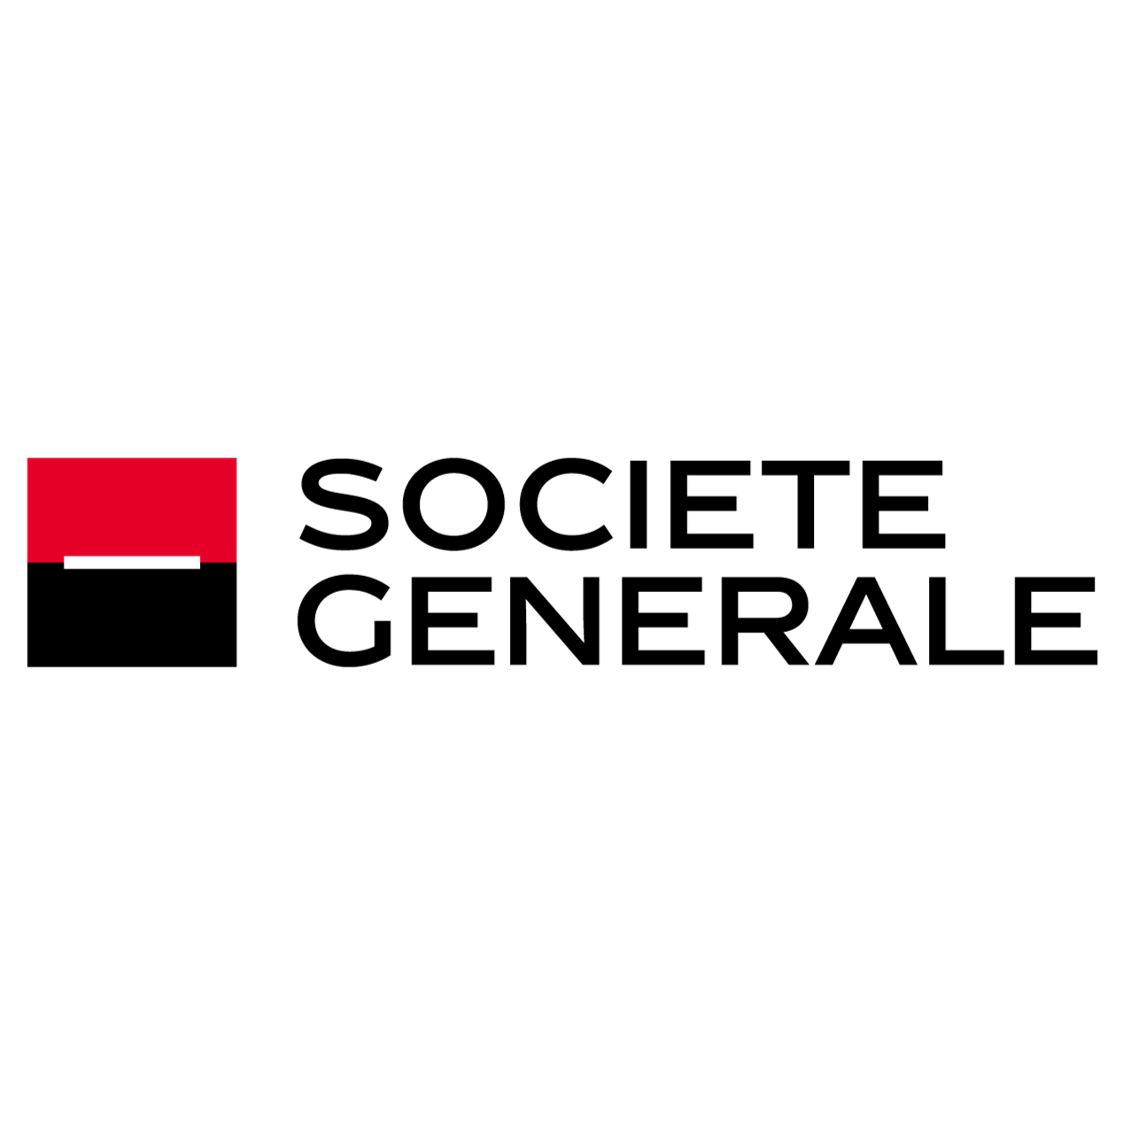 Société Générale Group